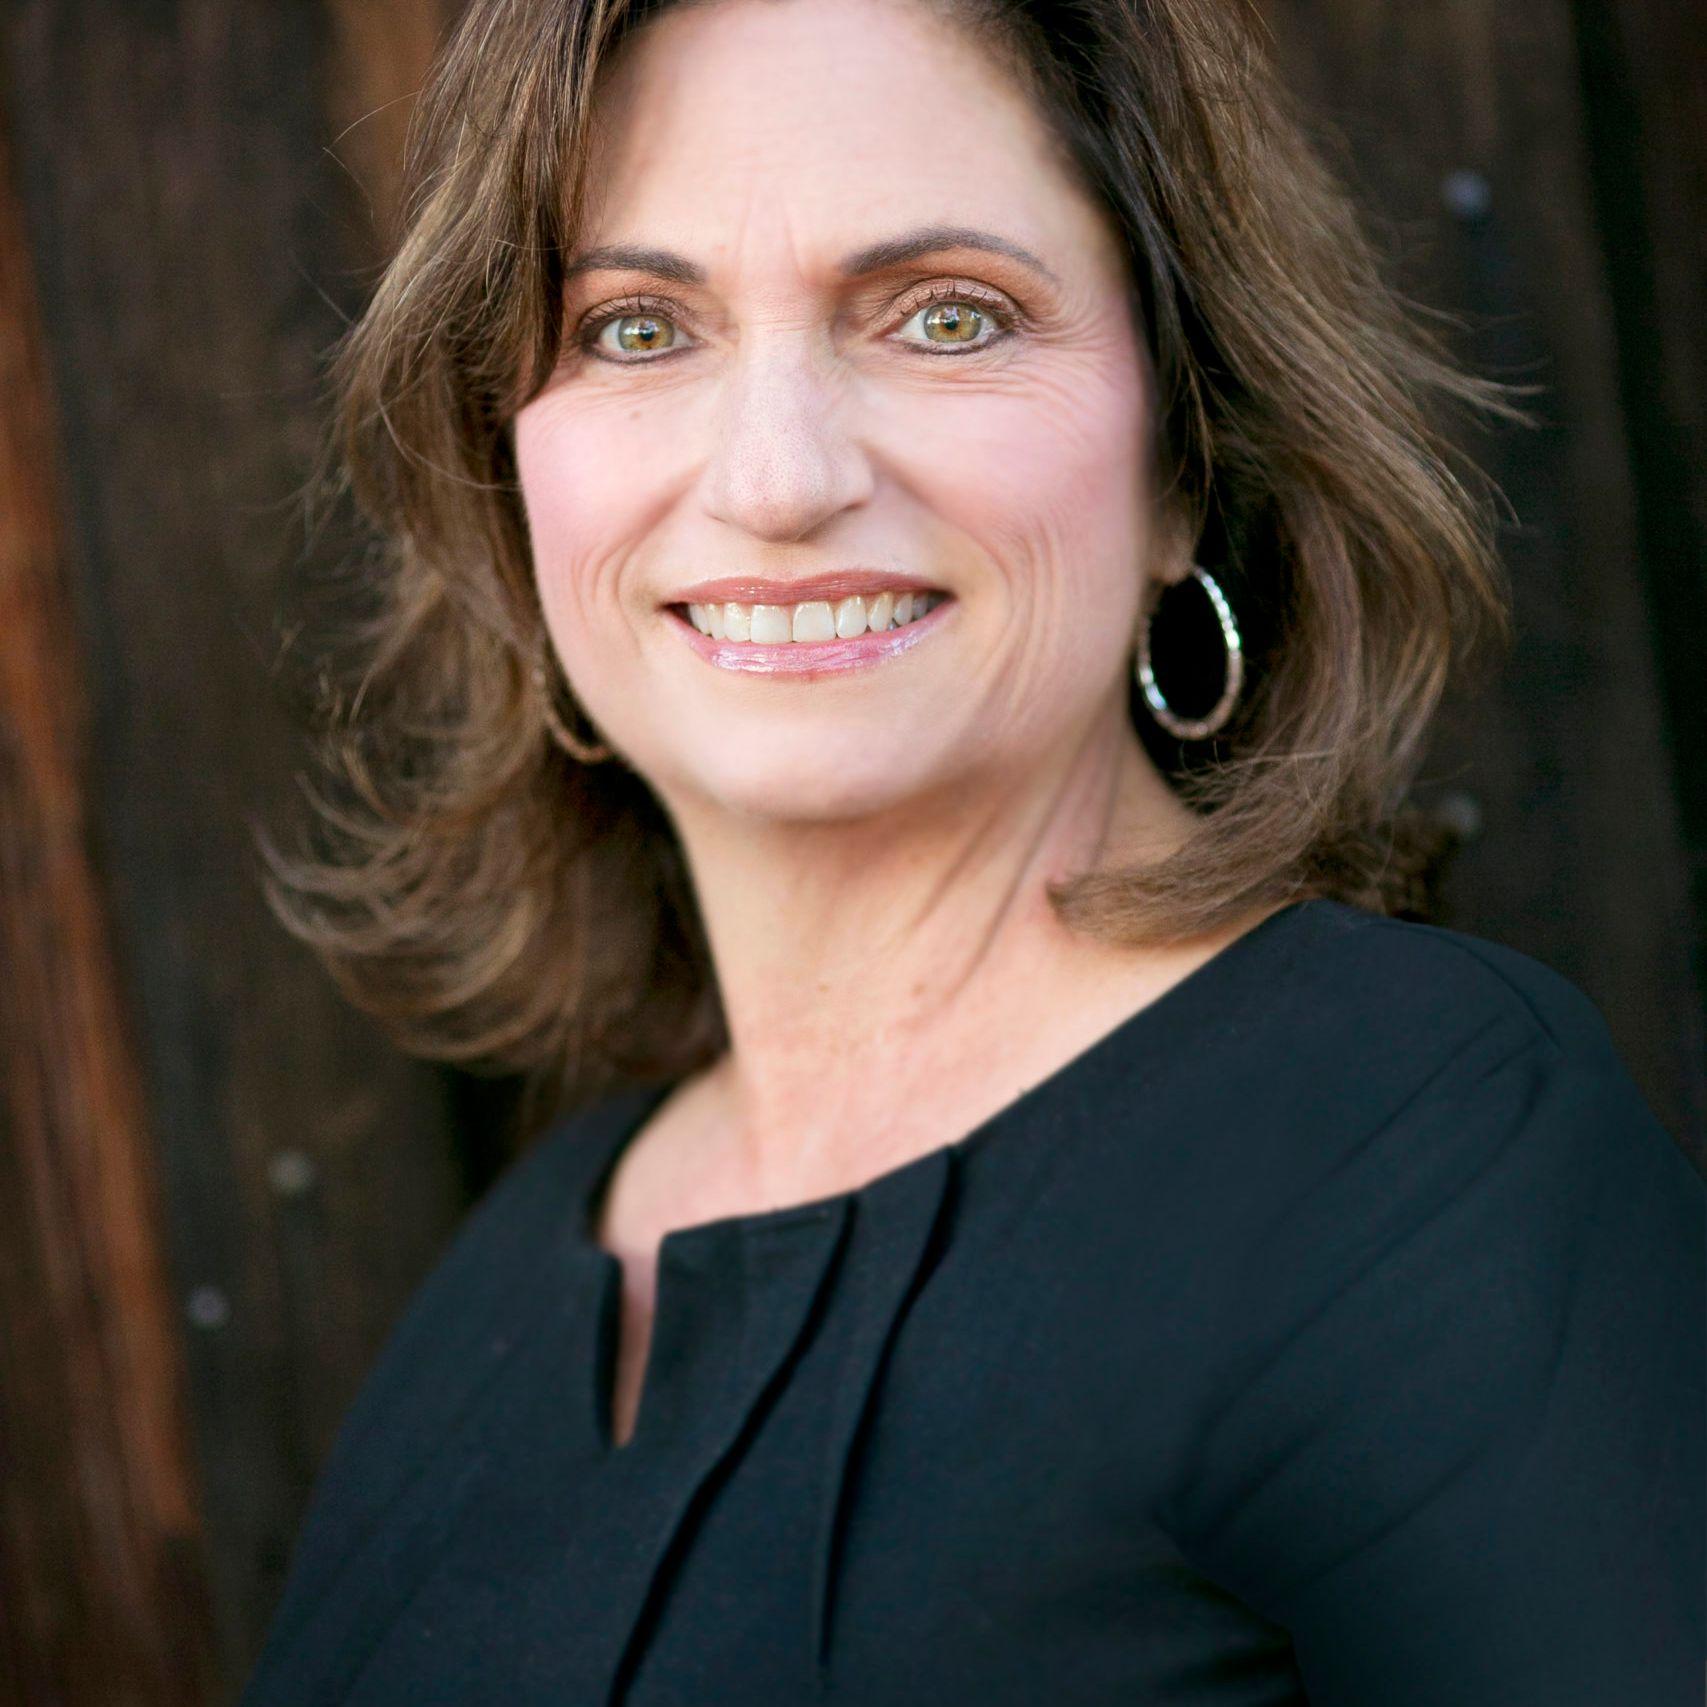 Cathy Palochko